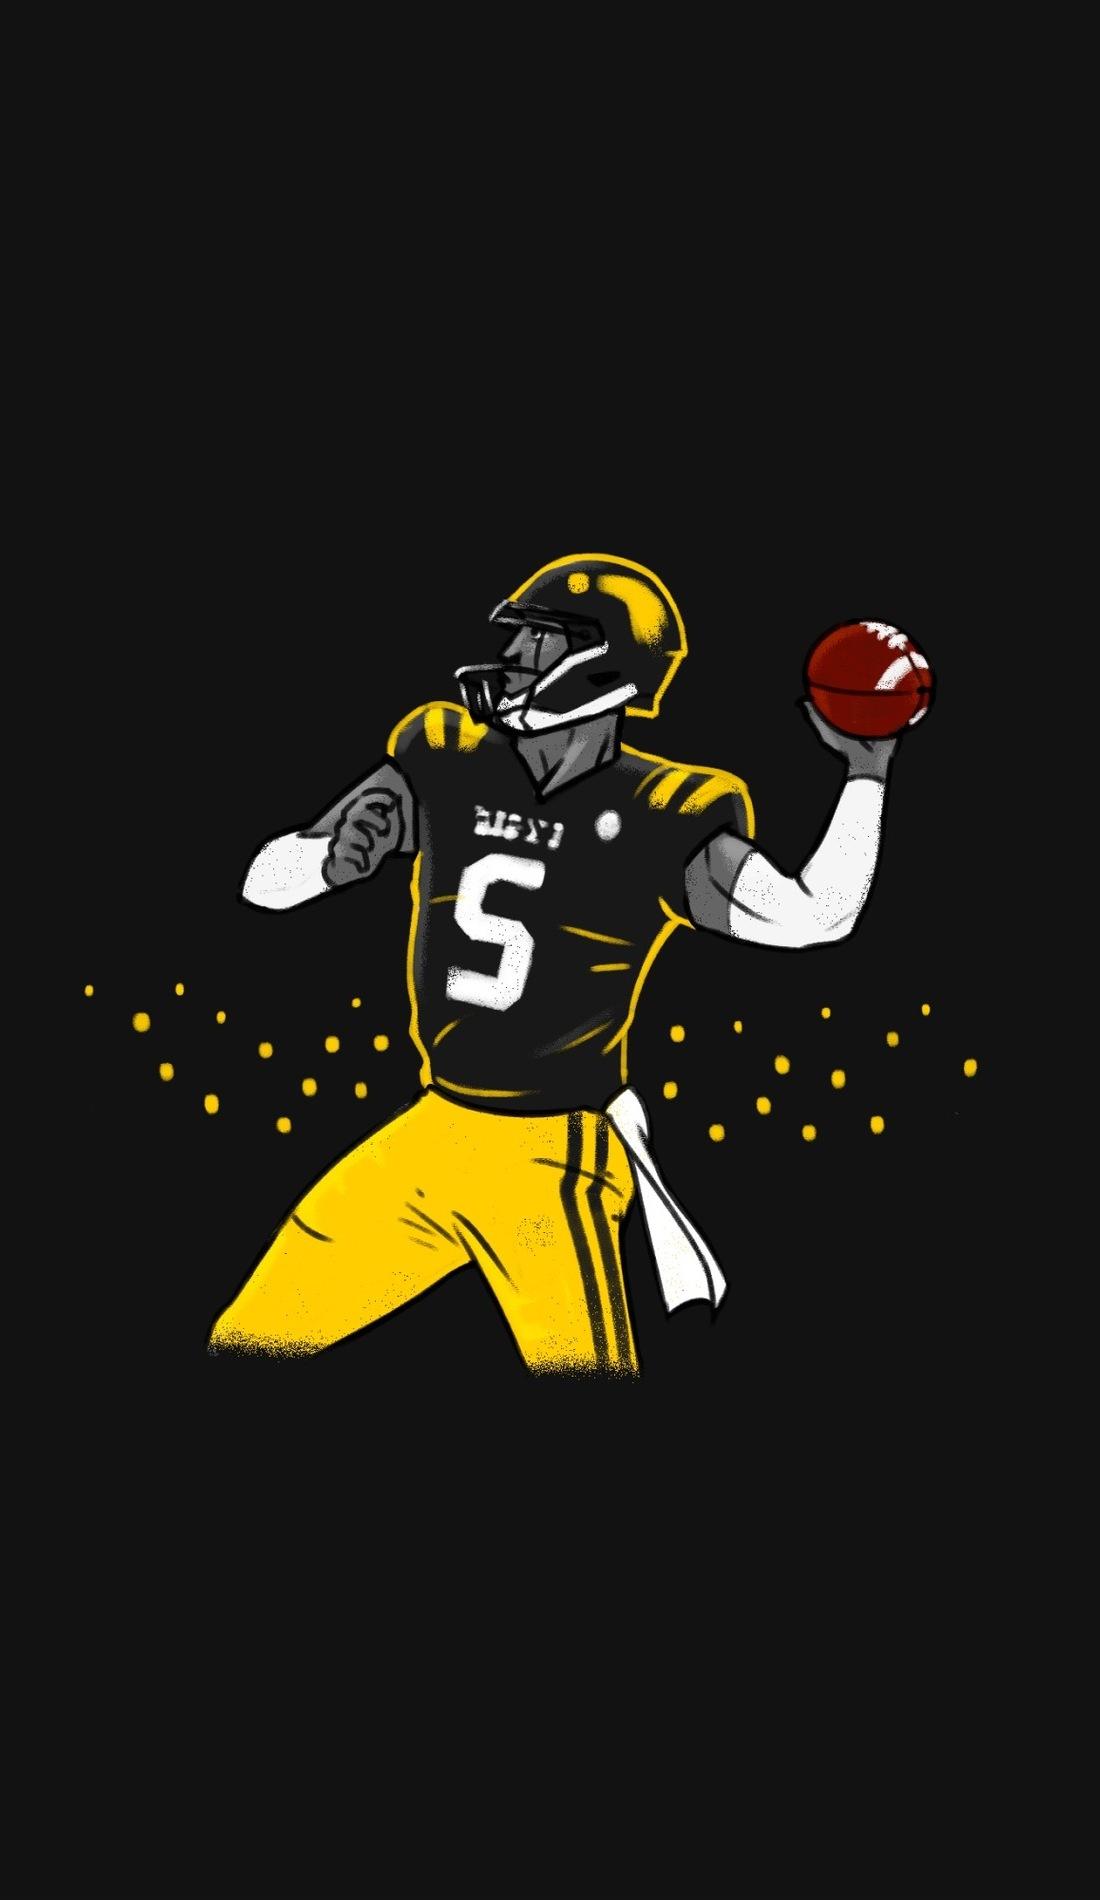 A Iowa Hawkeyes Football live event